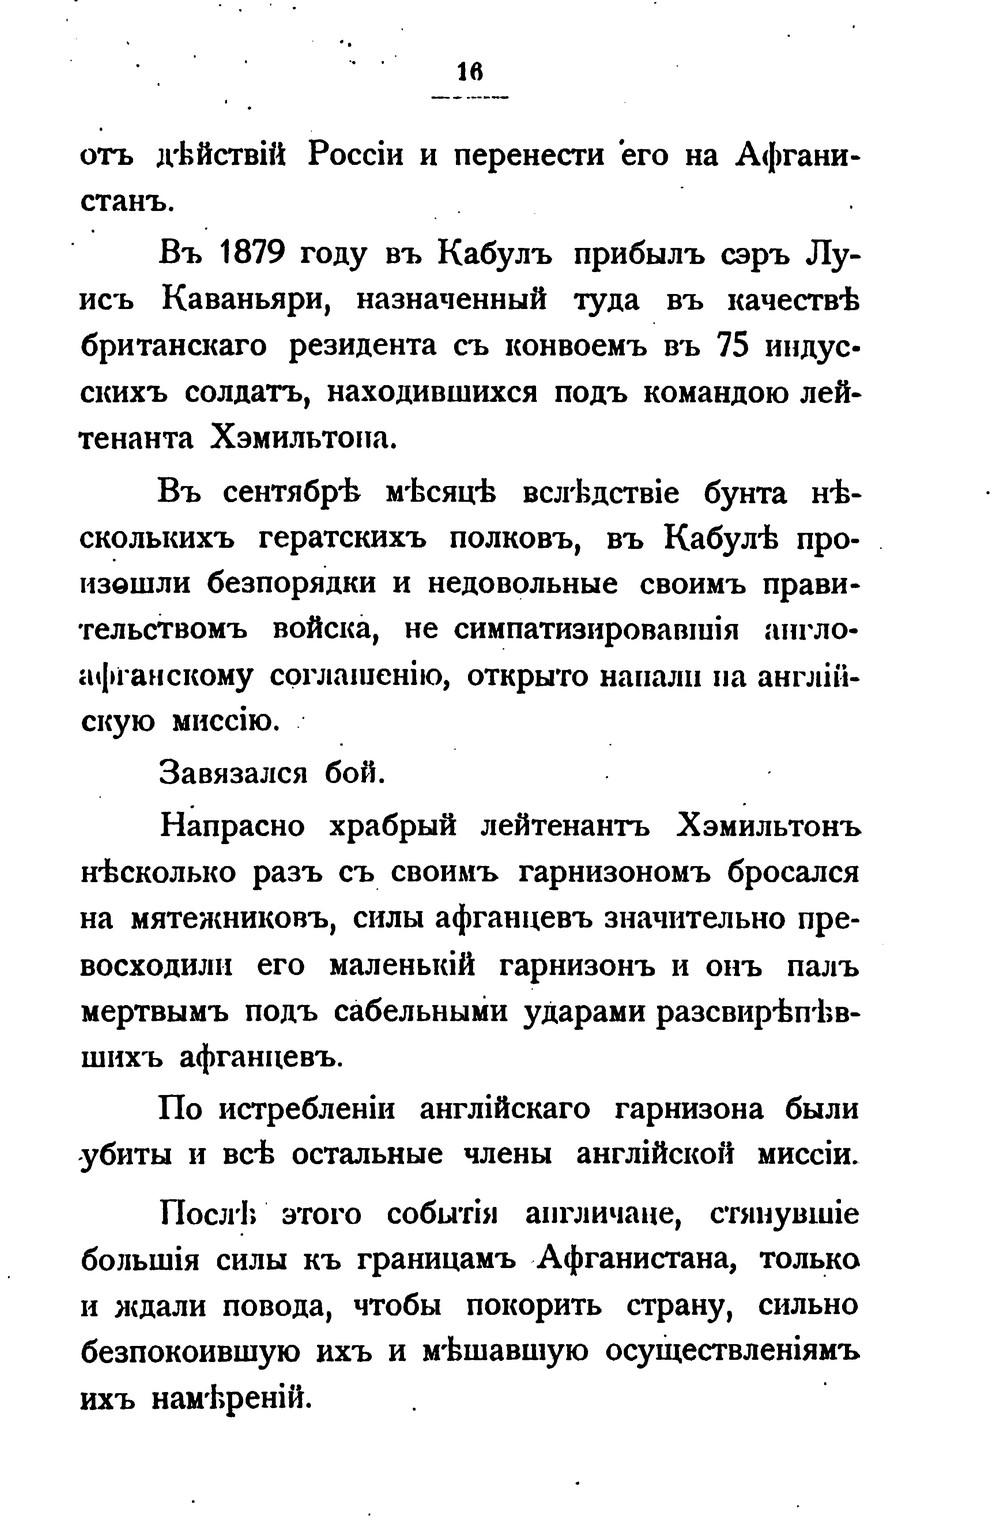 http://i6.imageban.ru/out/2013/11/02/830a8d473ae2258231c1c91bee55d04b.jpg